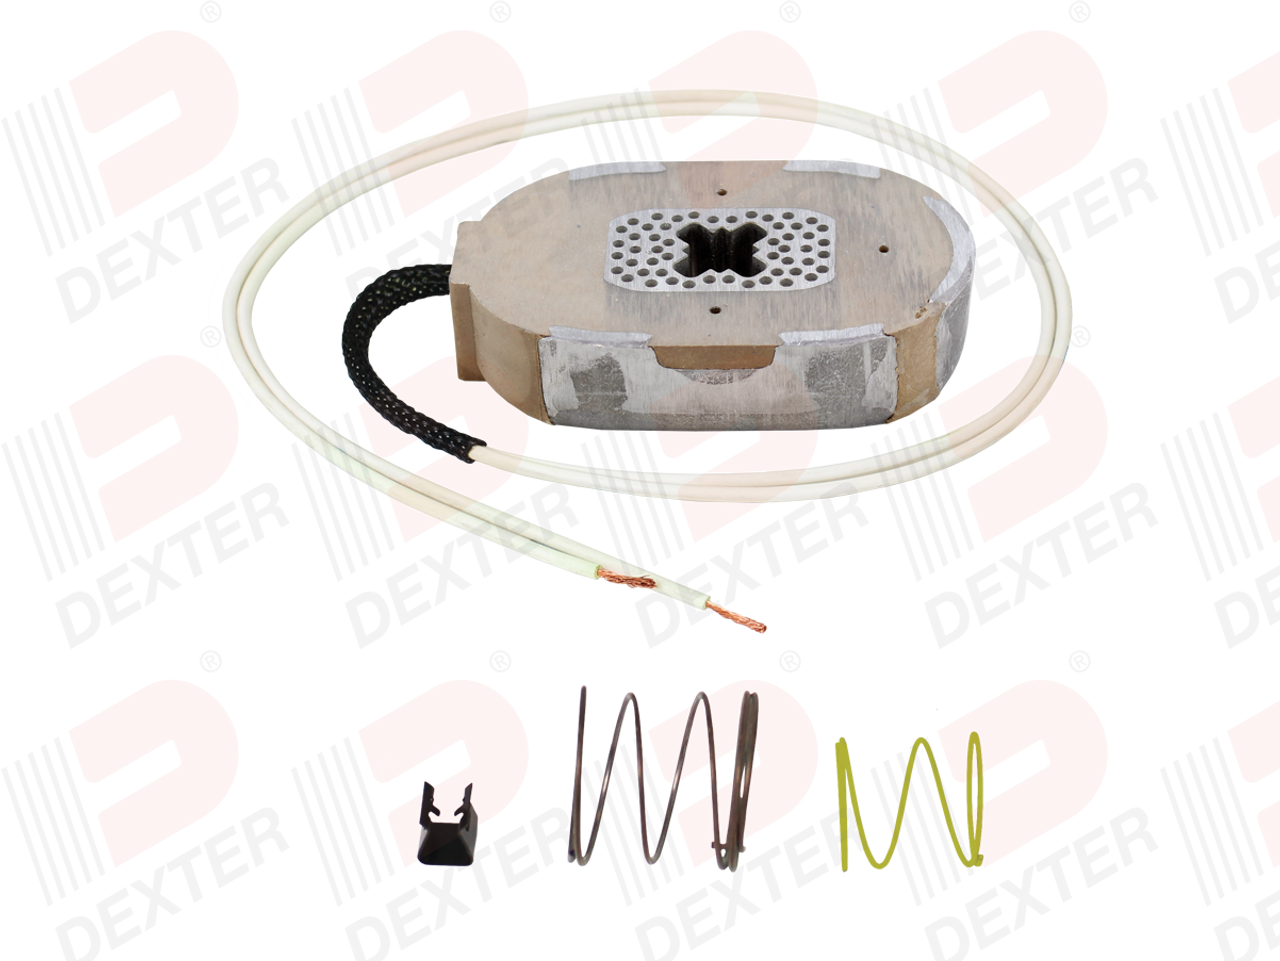 71105 --- Magnet Kit for 5,200 lb or 6,000 lb Capacity Dexter Electric Brake